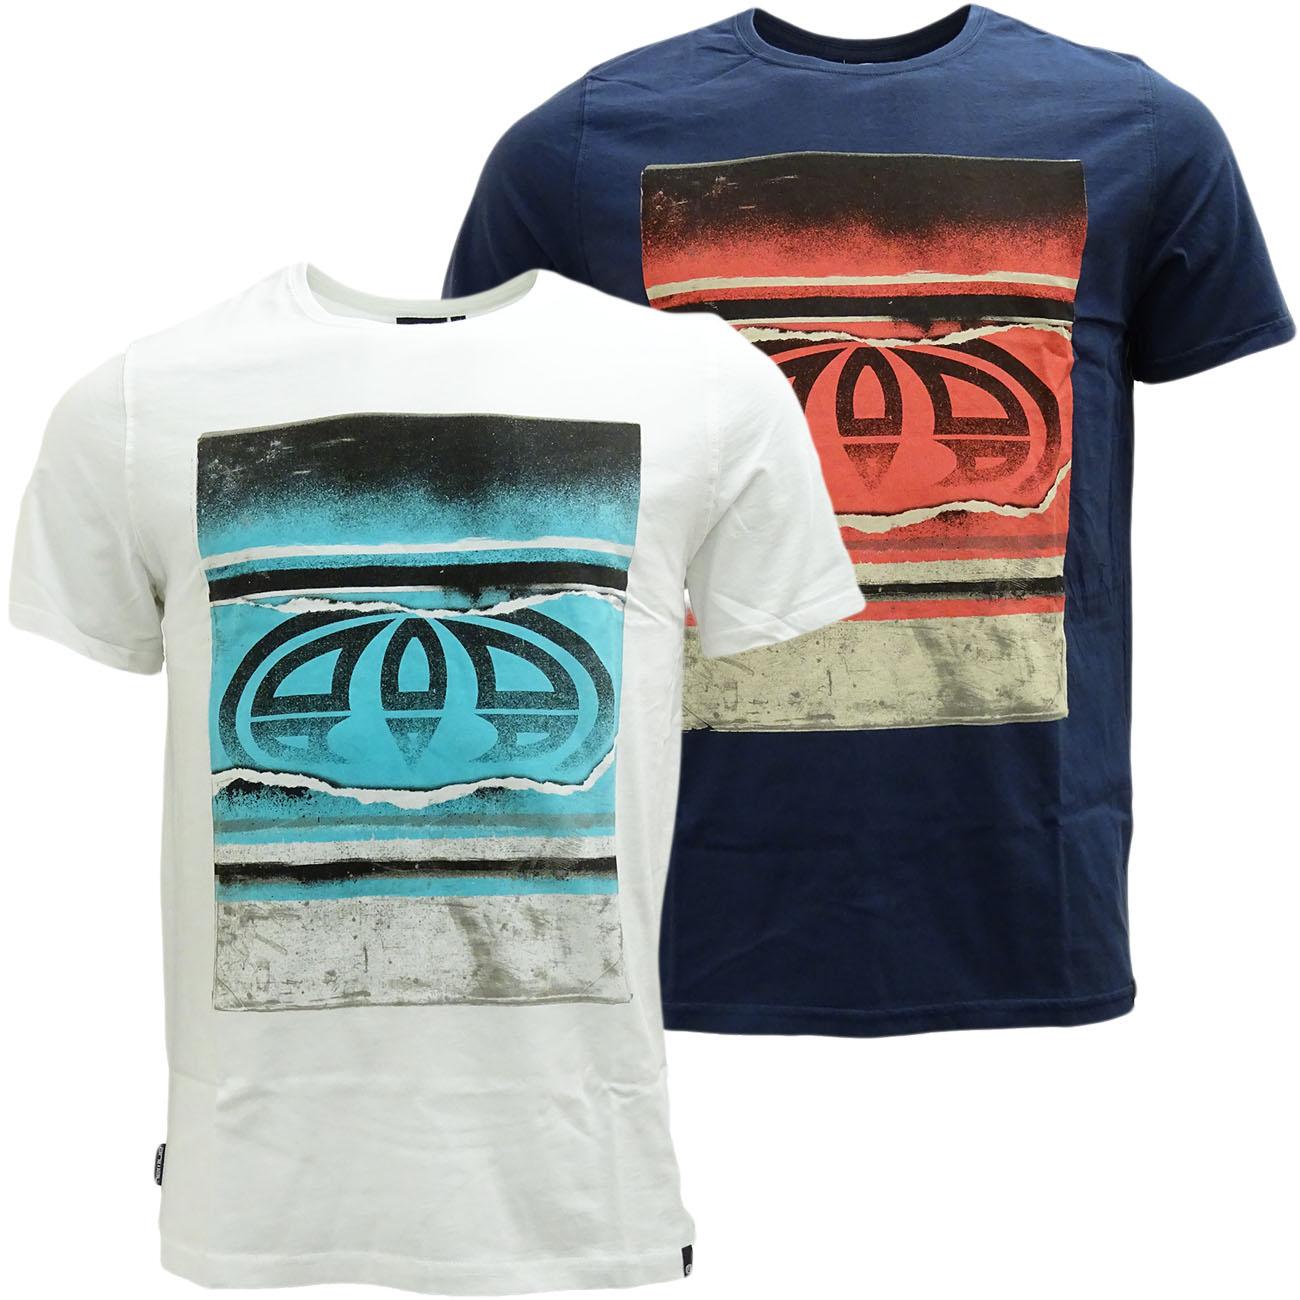 Mens Animal T Shirt - Mid Fit